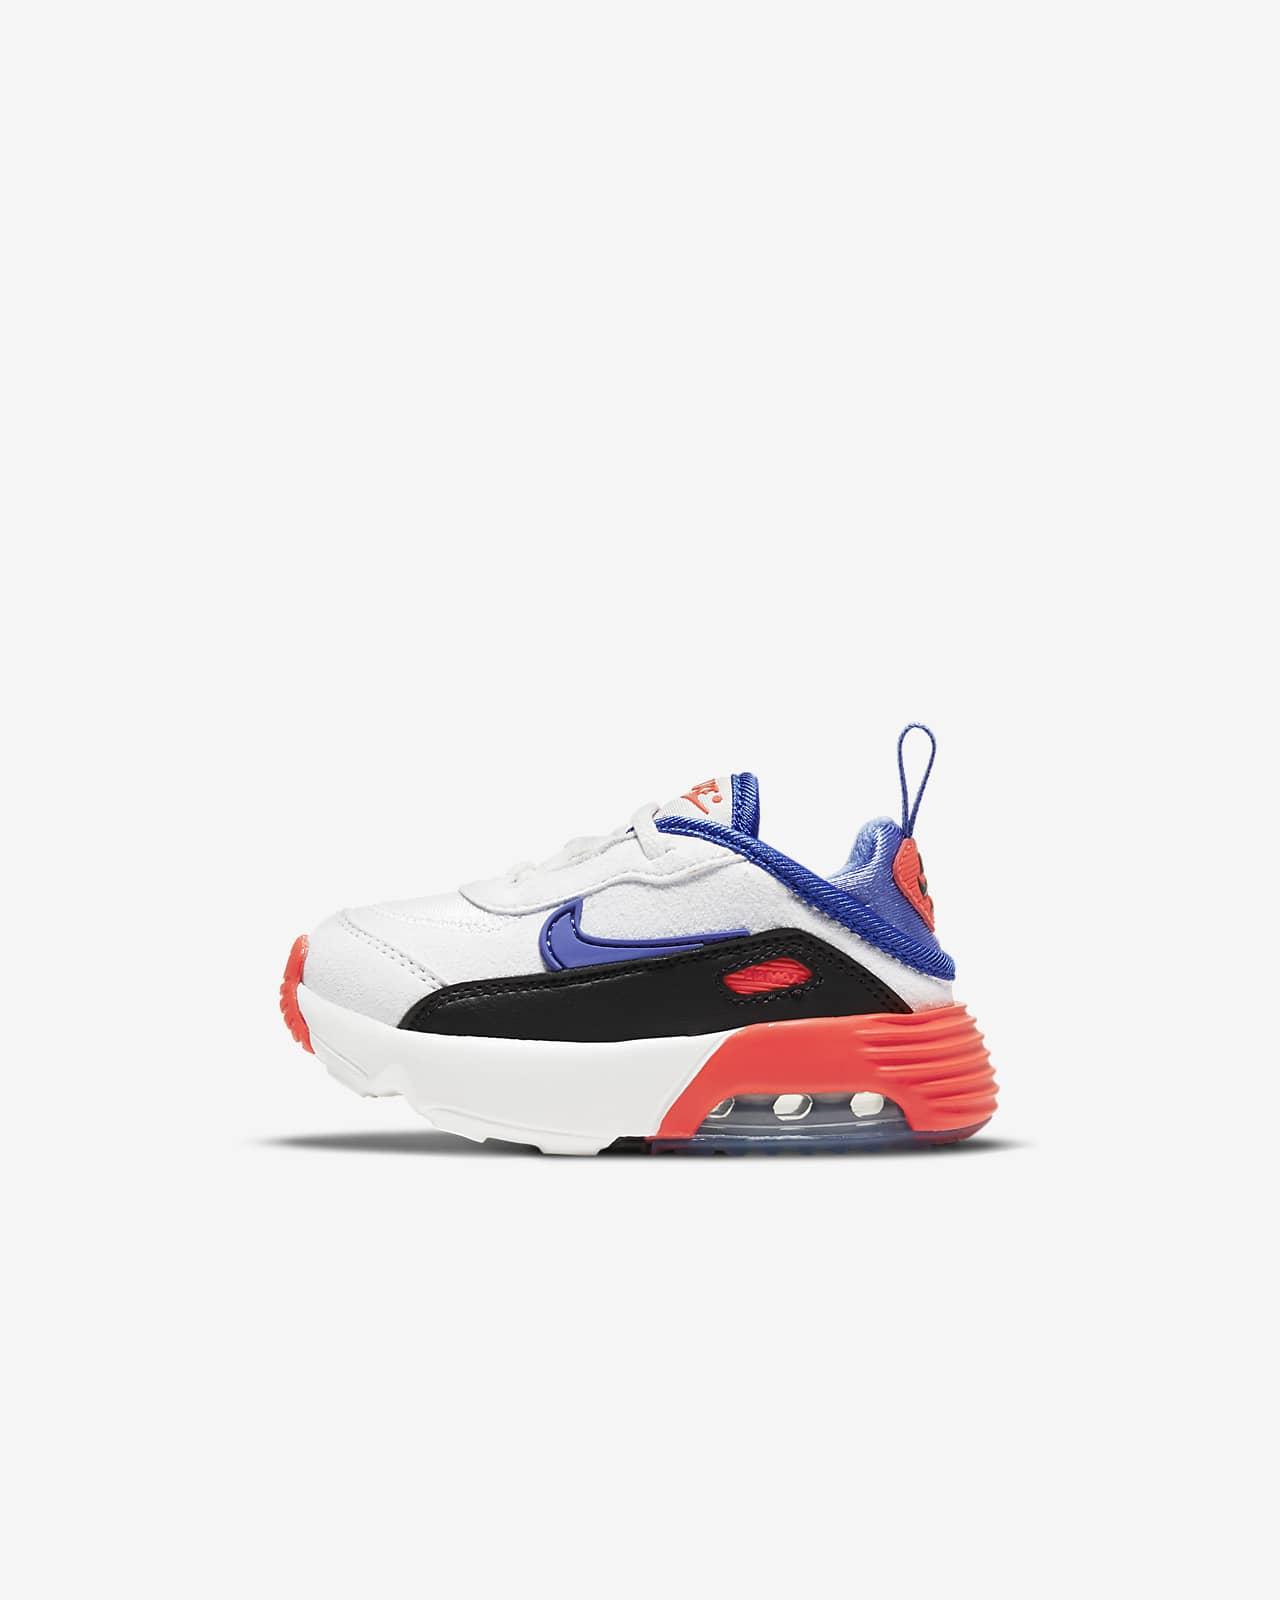 Bota Nike Air Max2090EOI prokojence abatolata